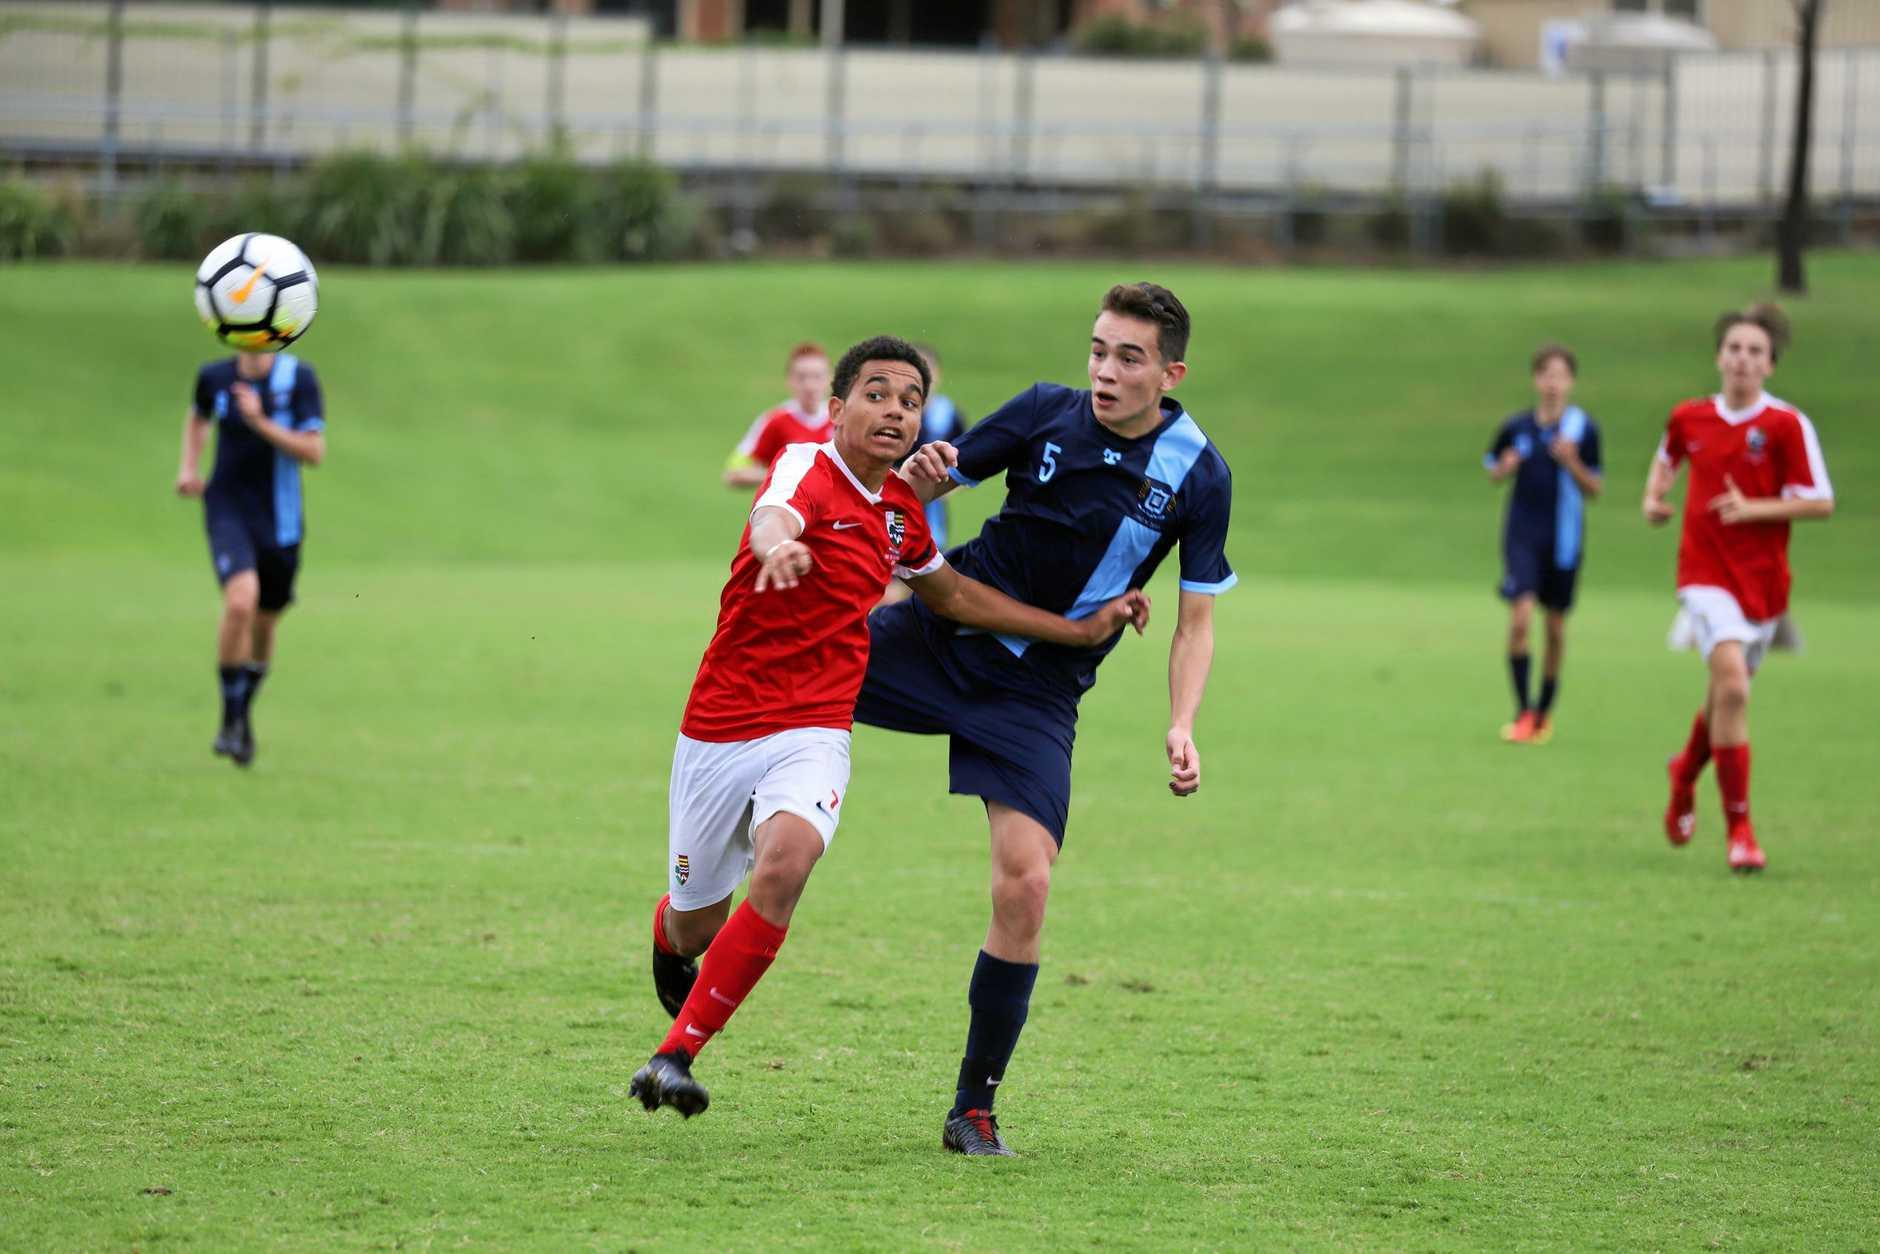 Ipswich Grammar School goal scorer Darryl Barton.